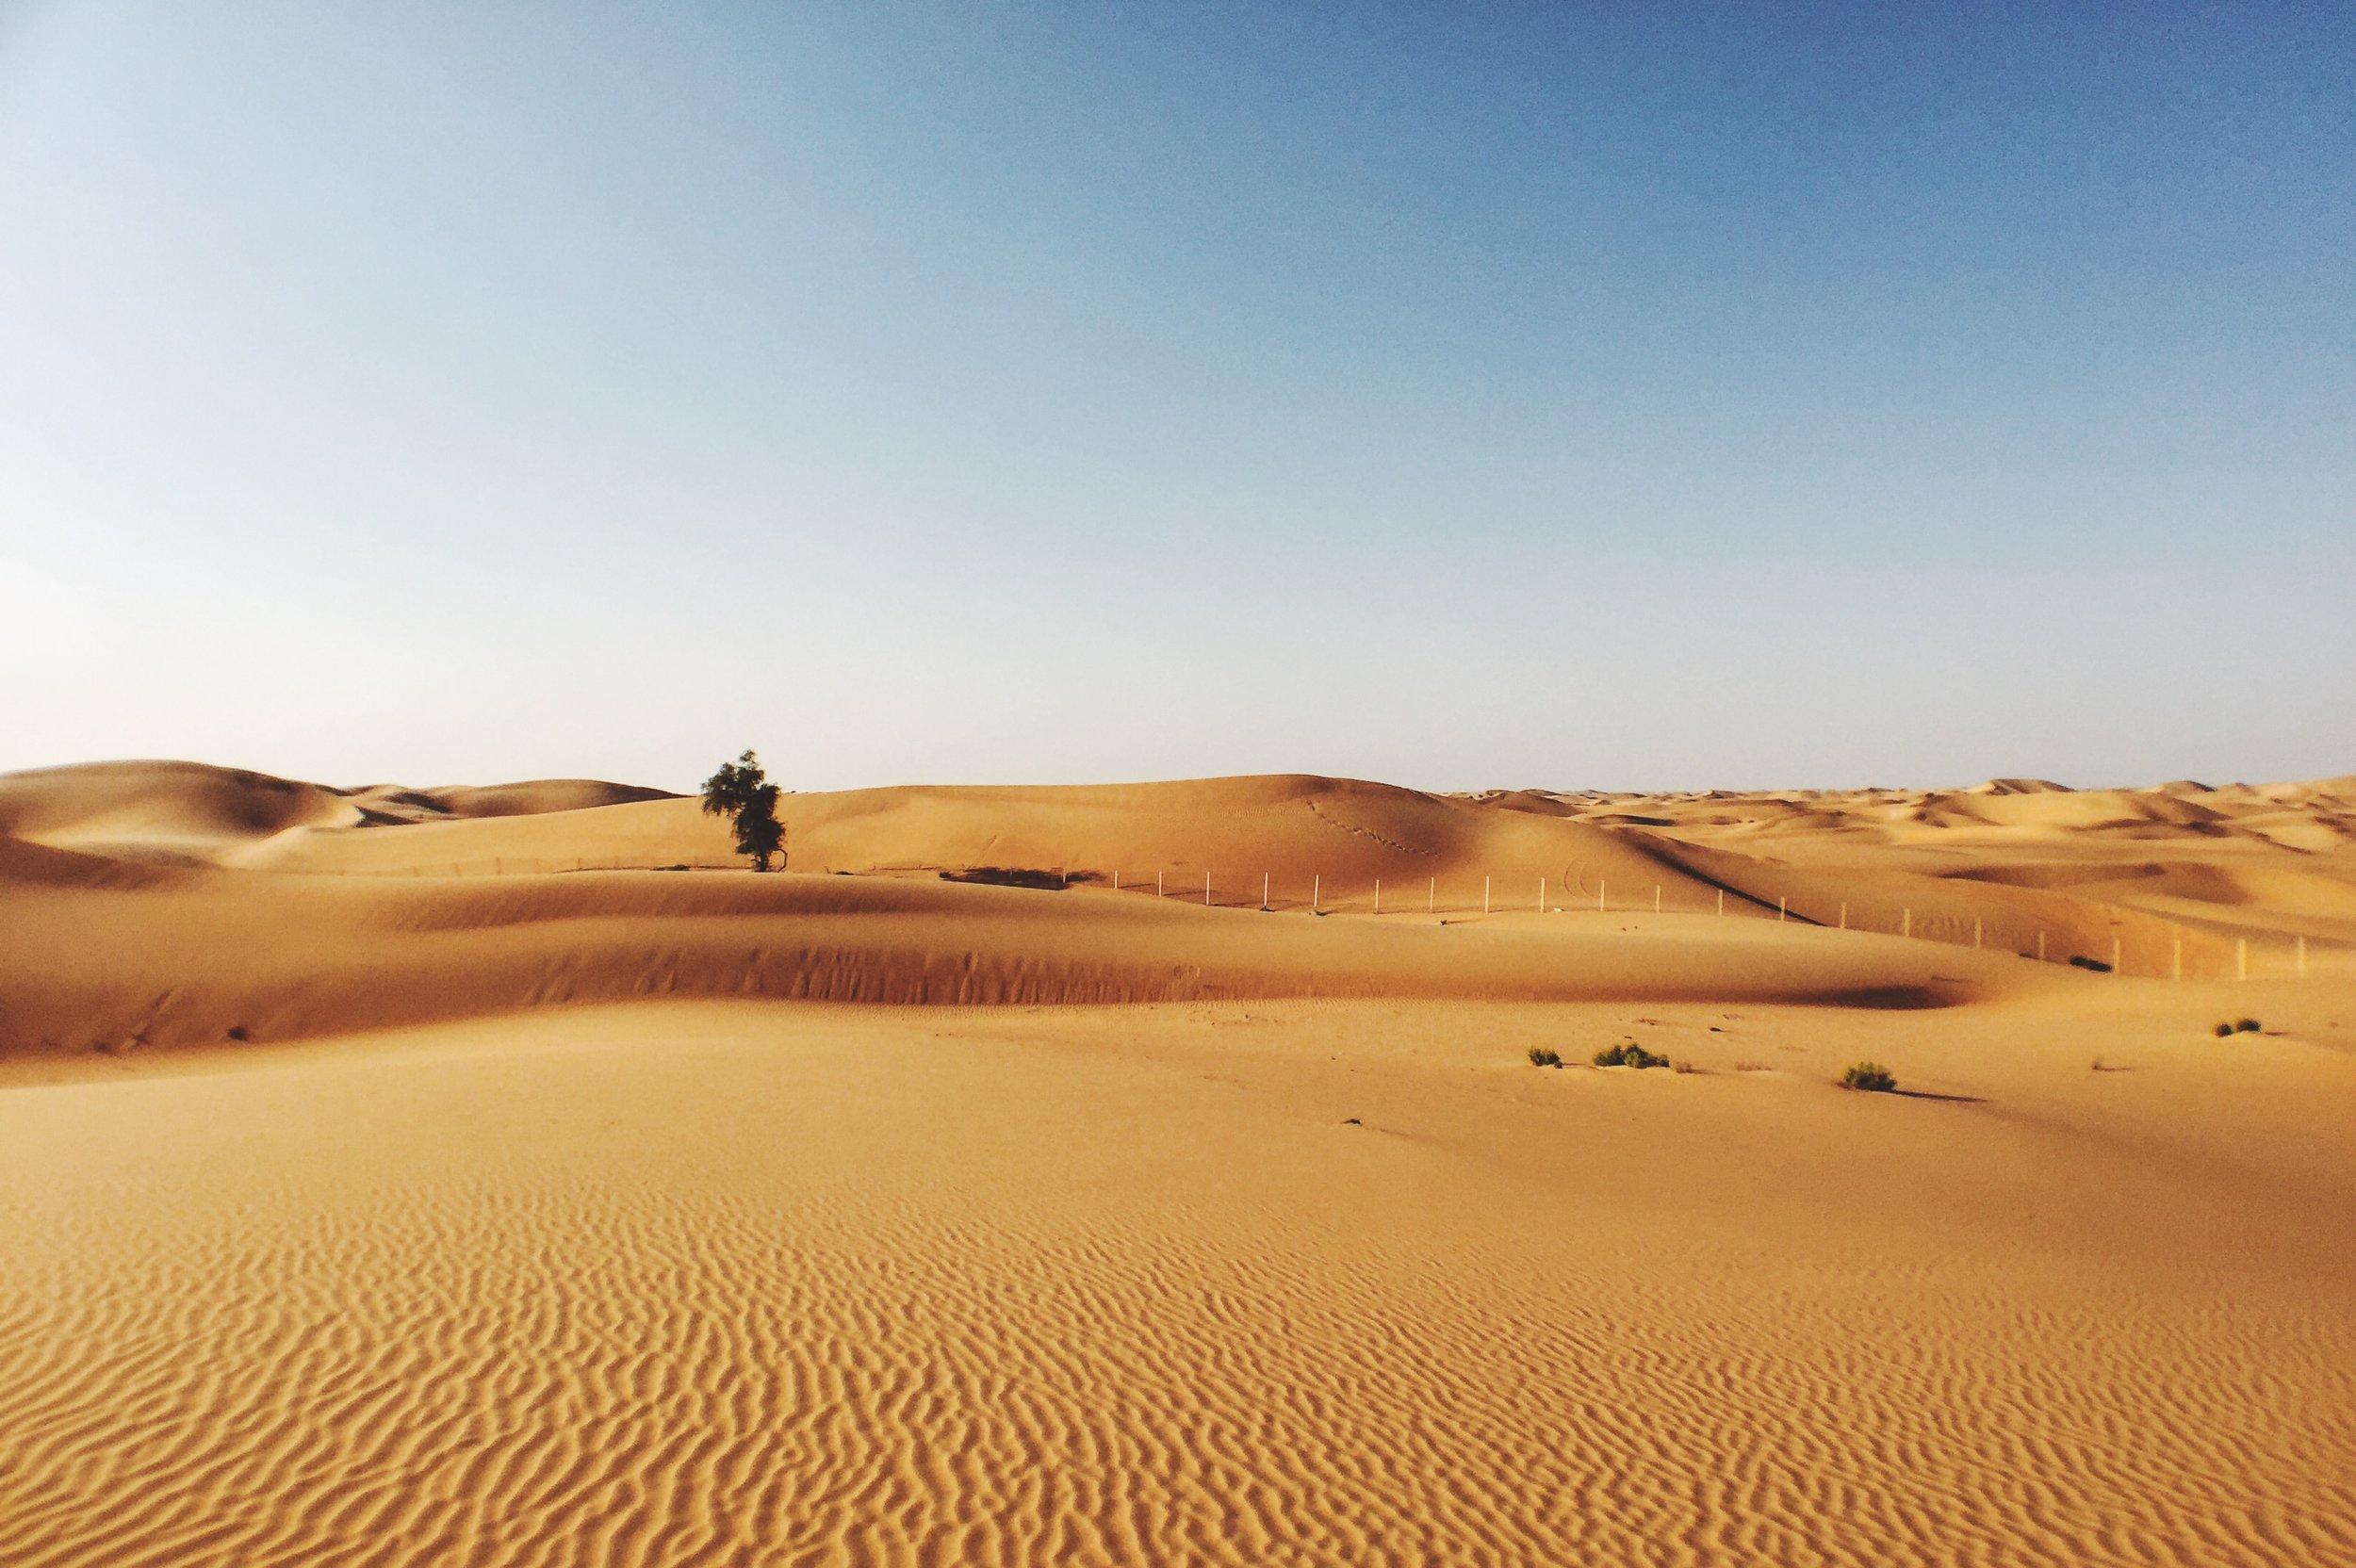 Arabian-Nights-Lorraine-Yeung-5.jpg